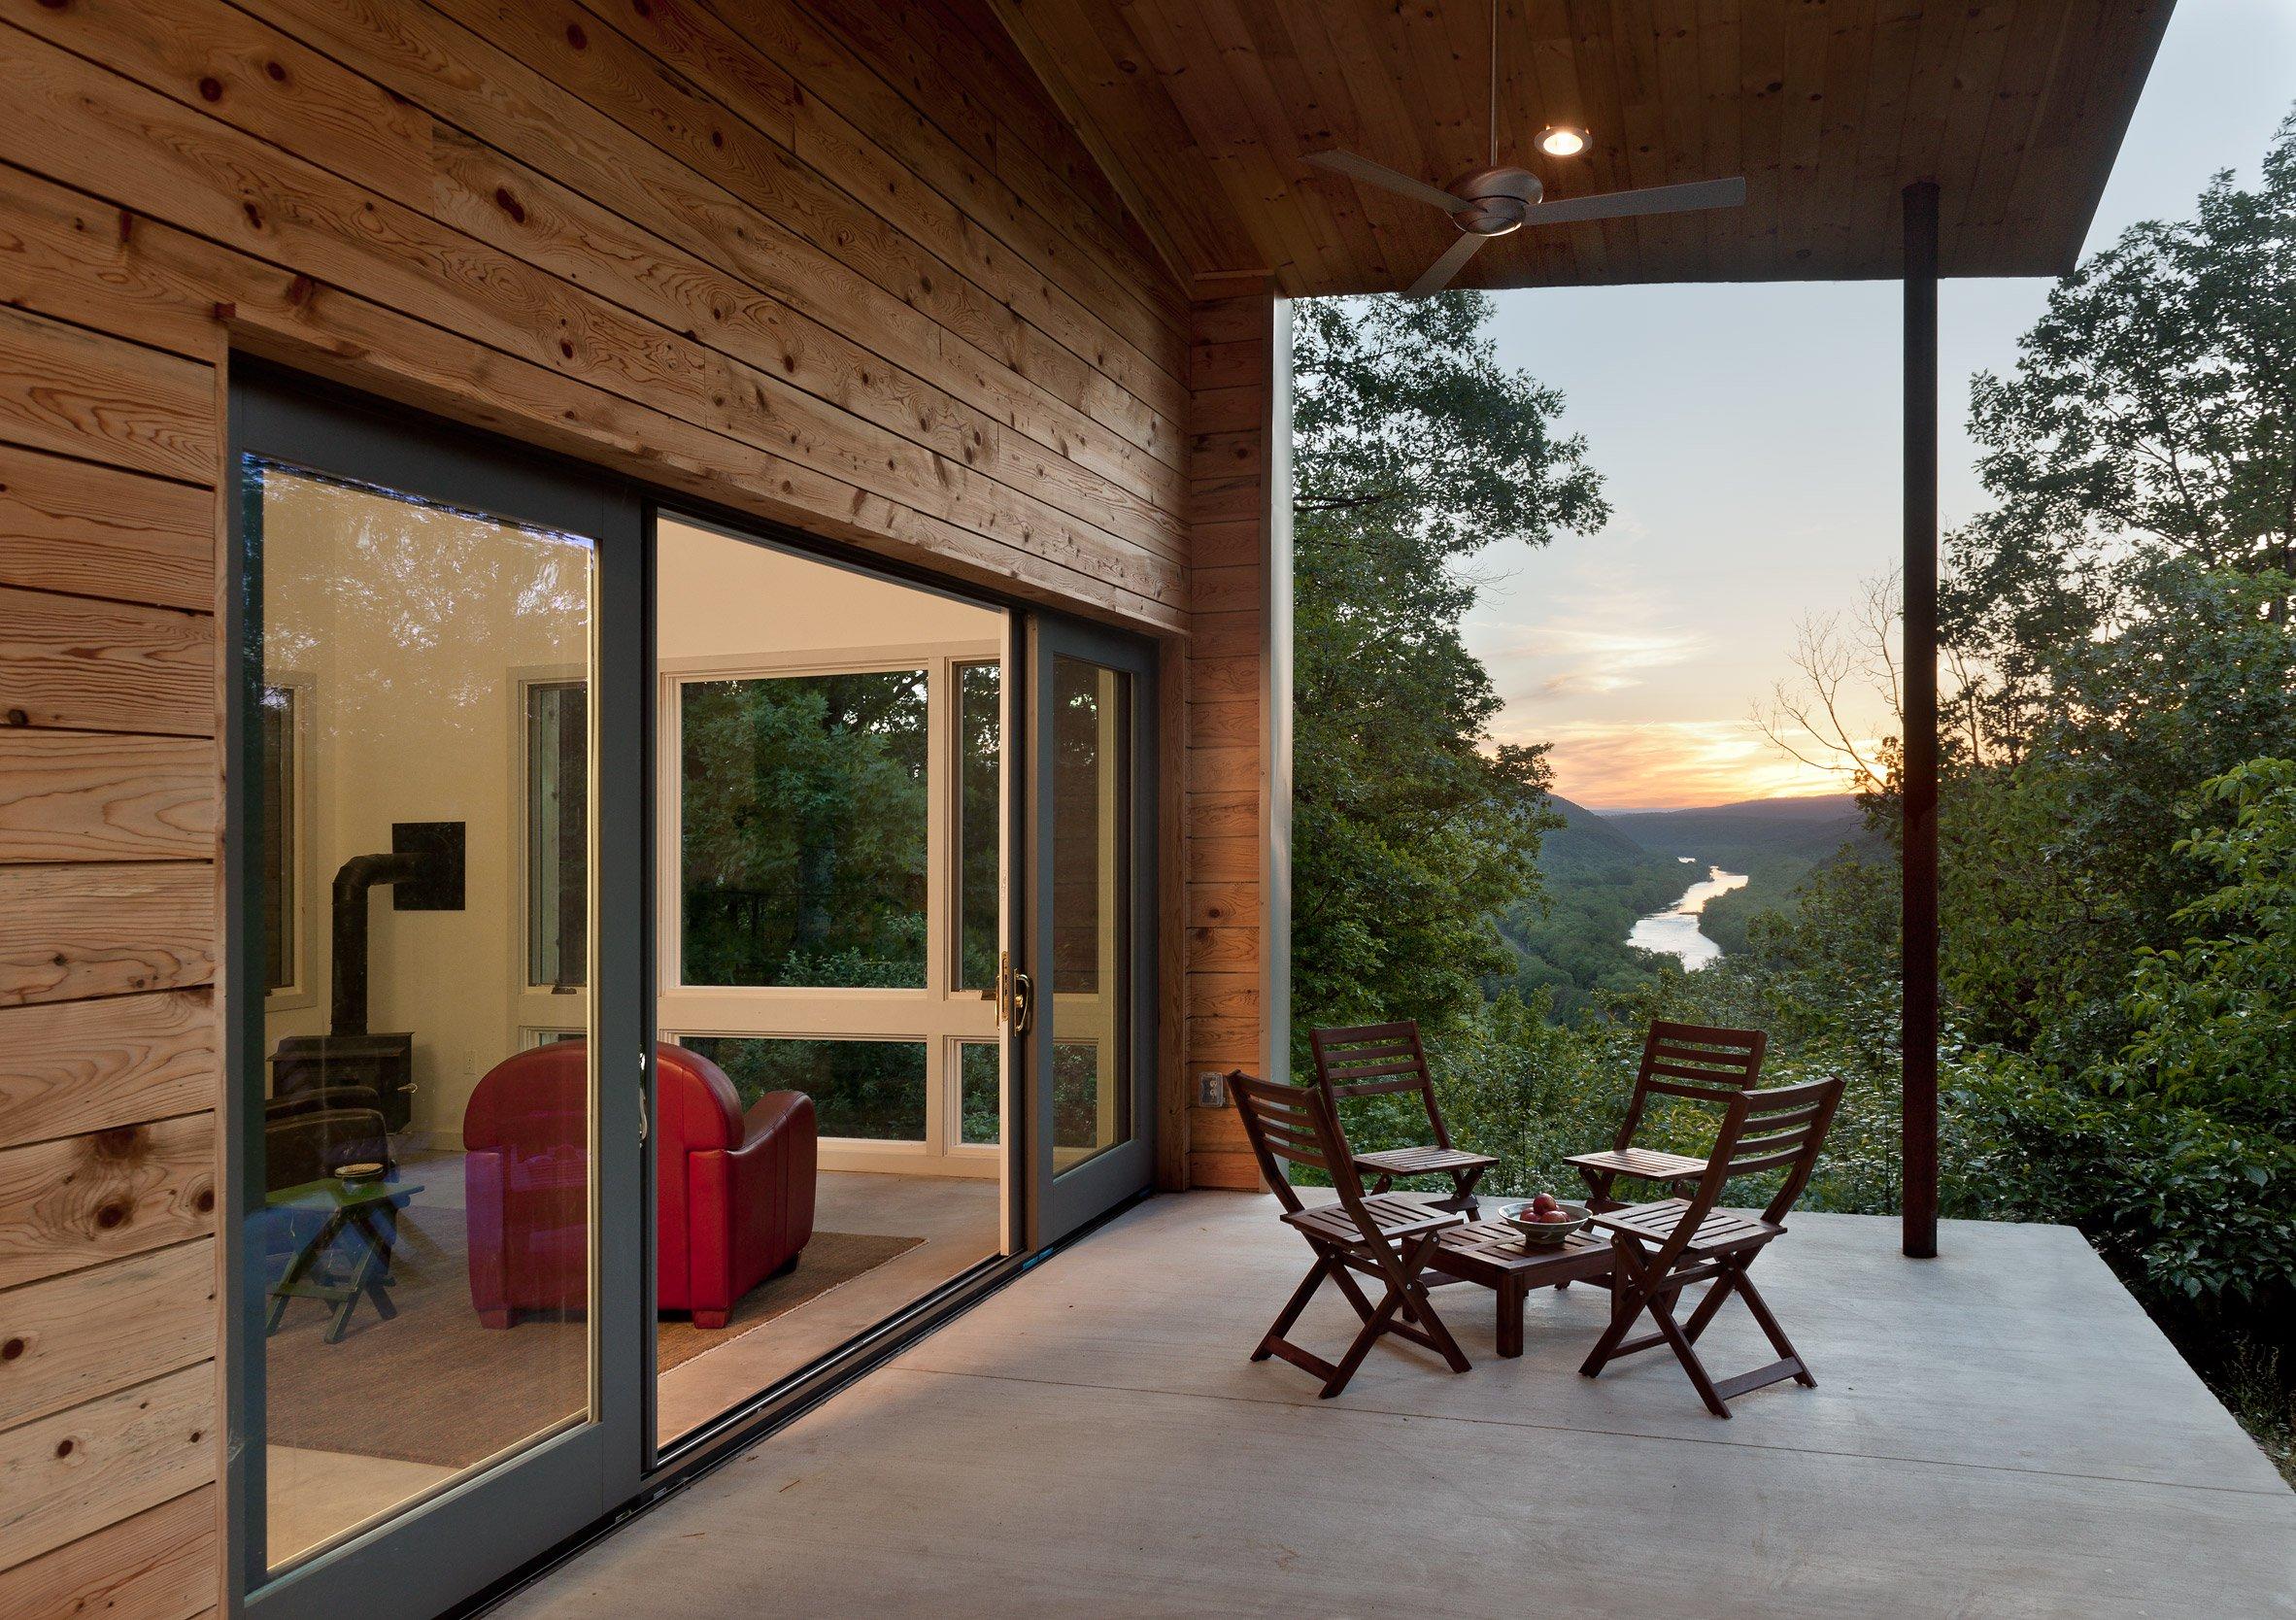 Exterior view of porch overlooking river valley below.